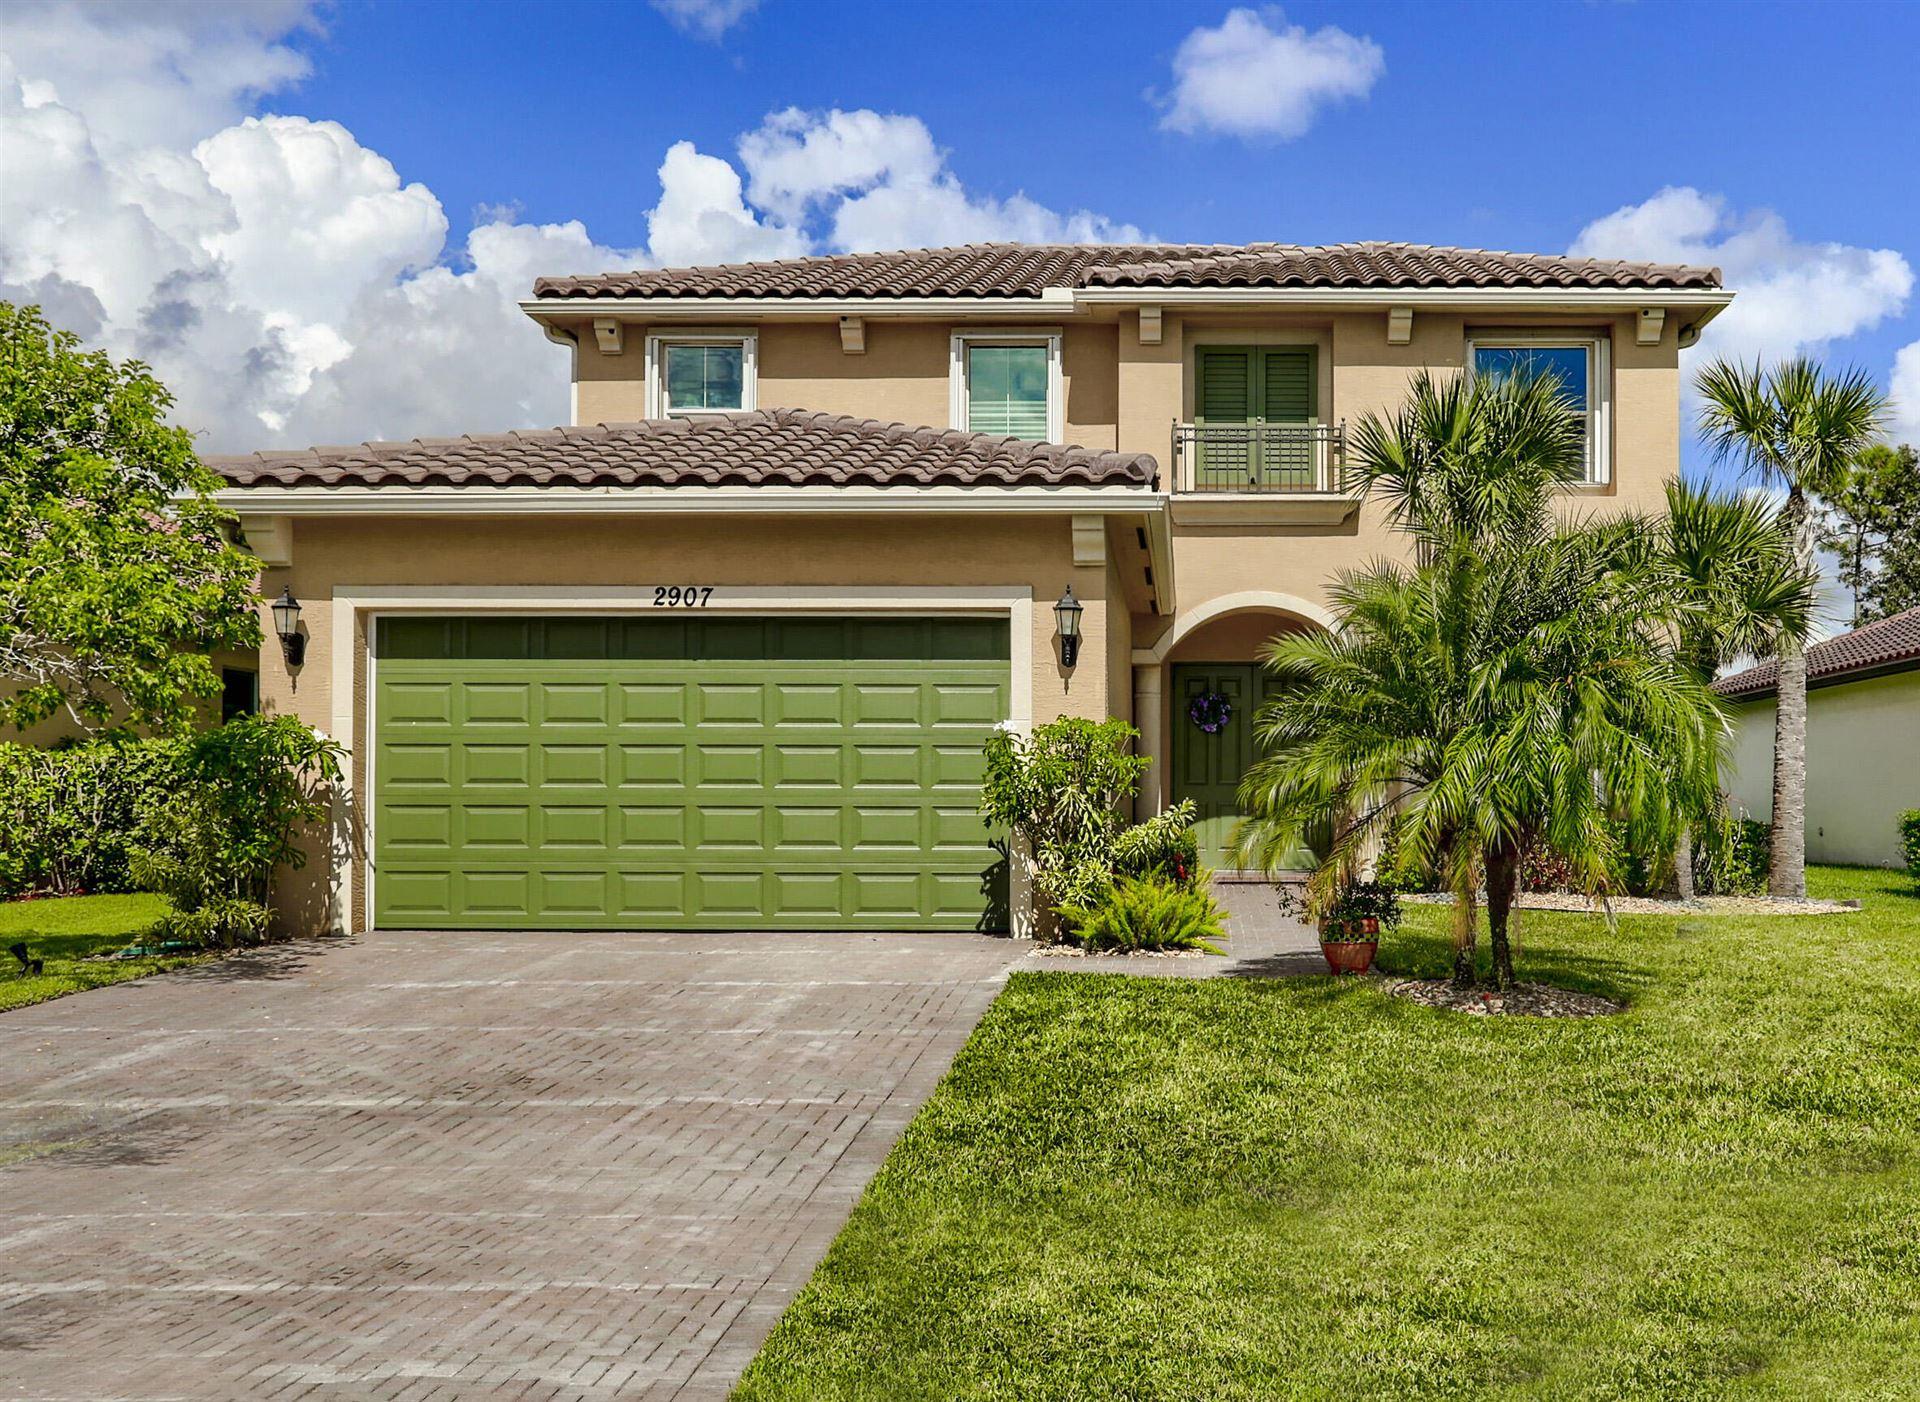 2907 Bellarosa Circle, Royal Palm Beach, FL 33411 - #: RX-10752774